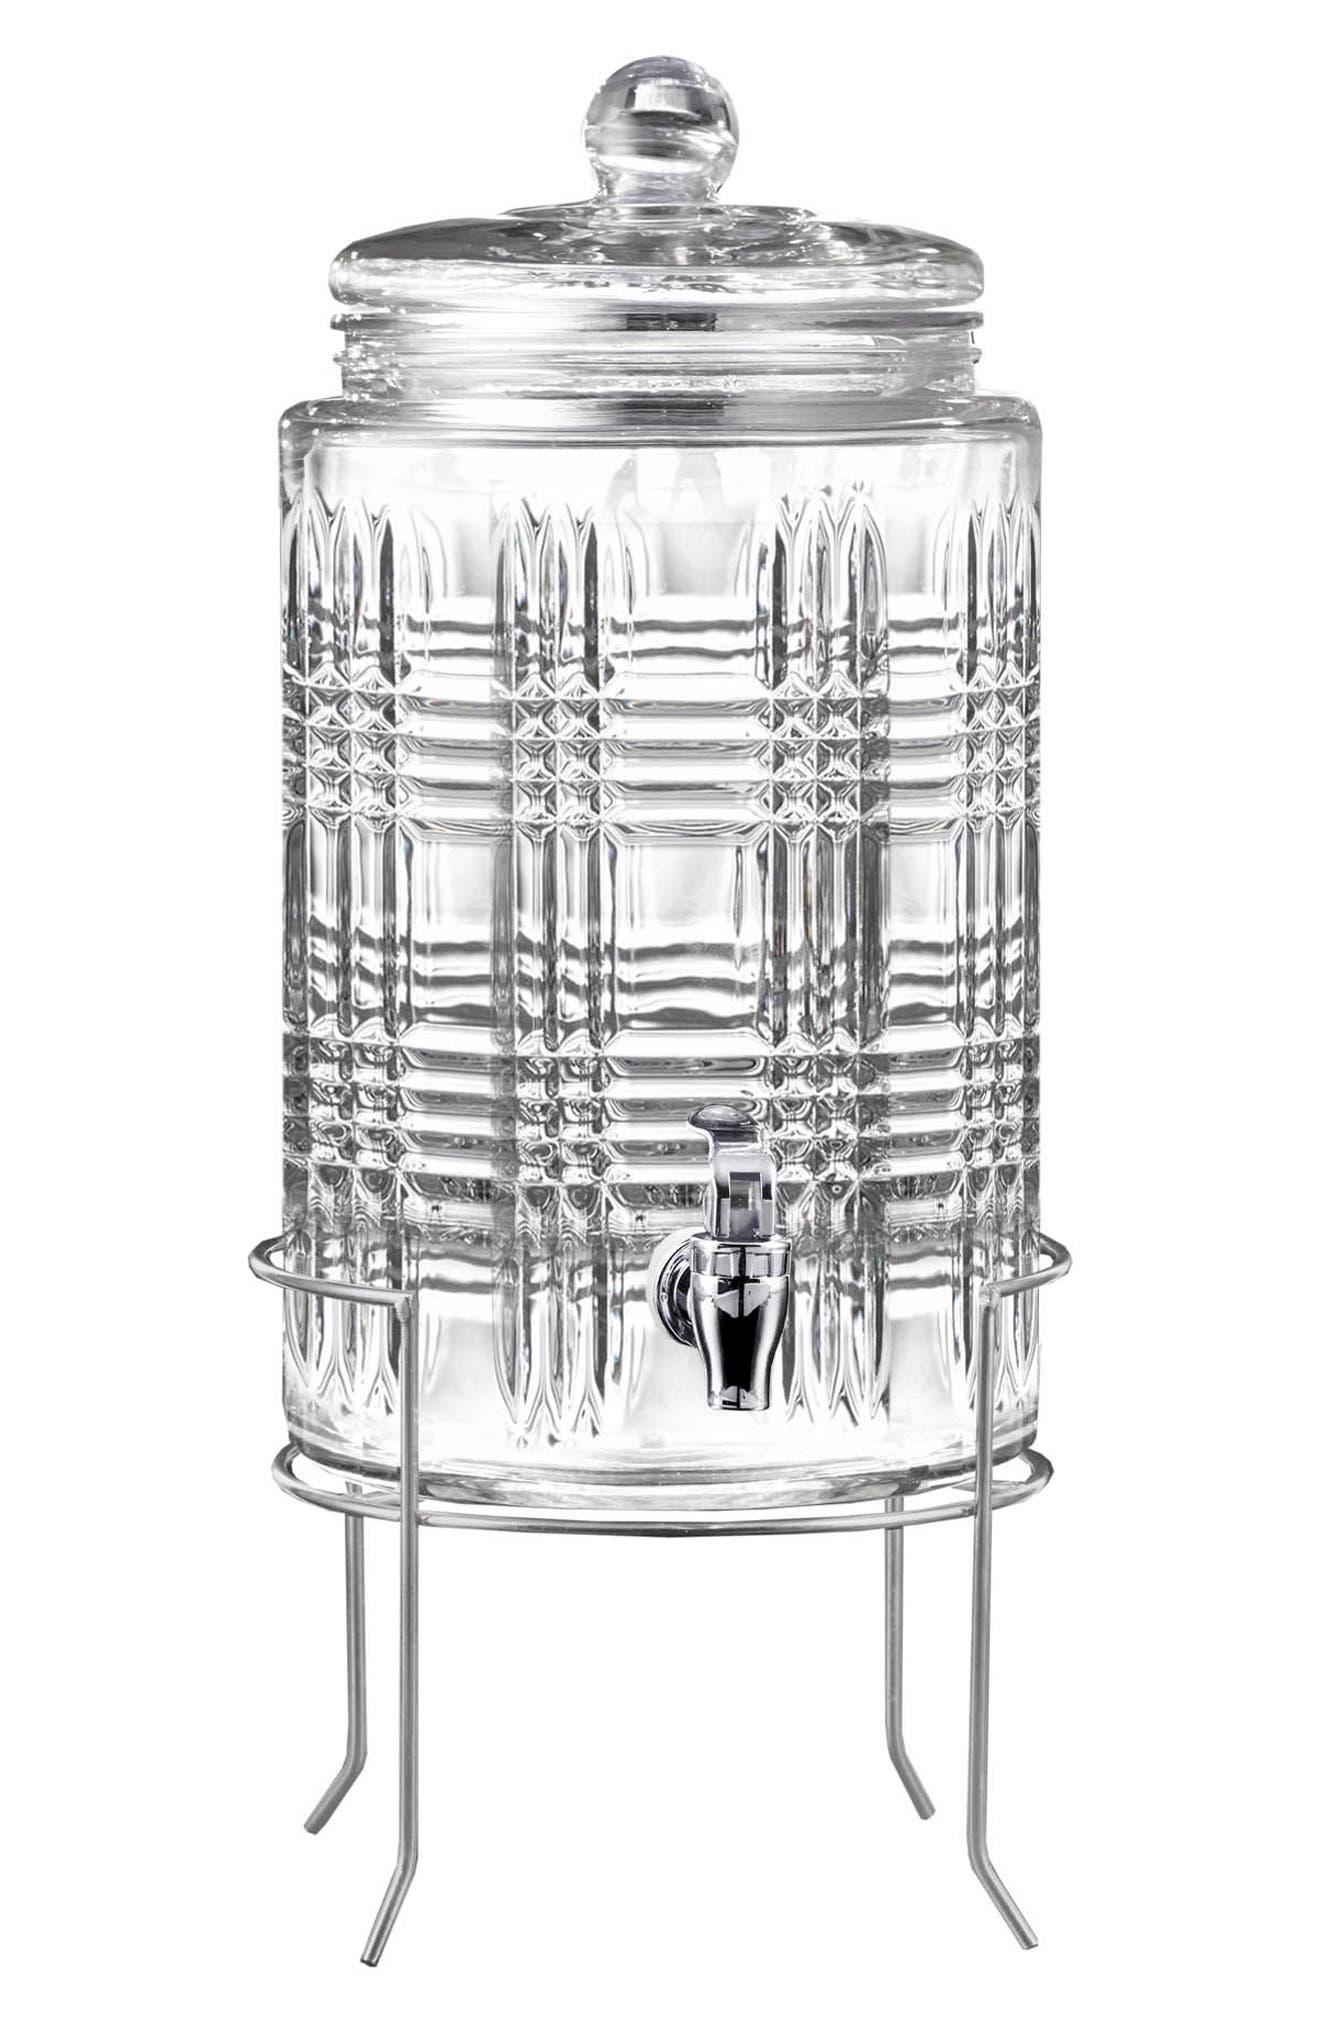 American Atelier Portland Beverage Dispenser & Stand